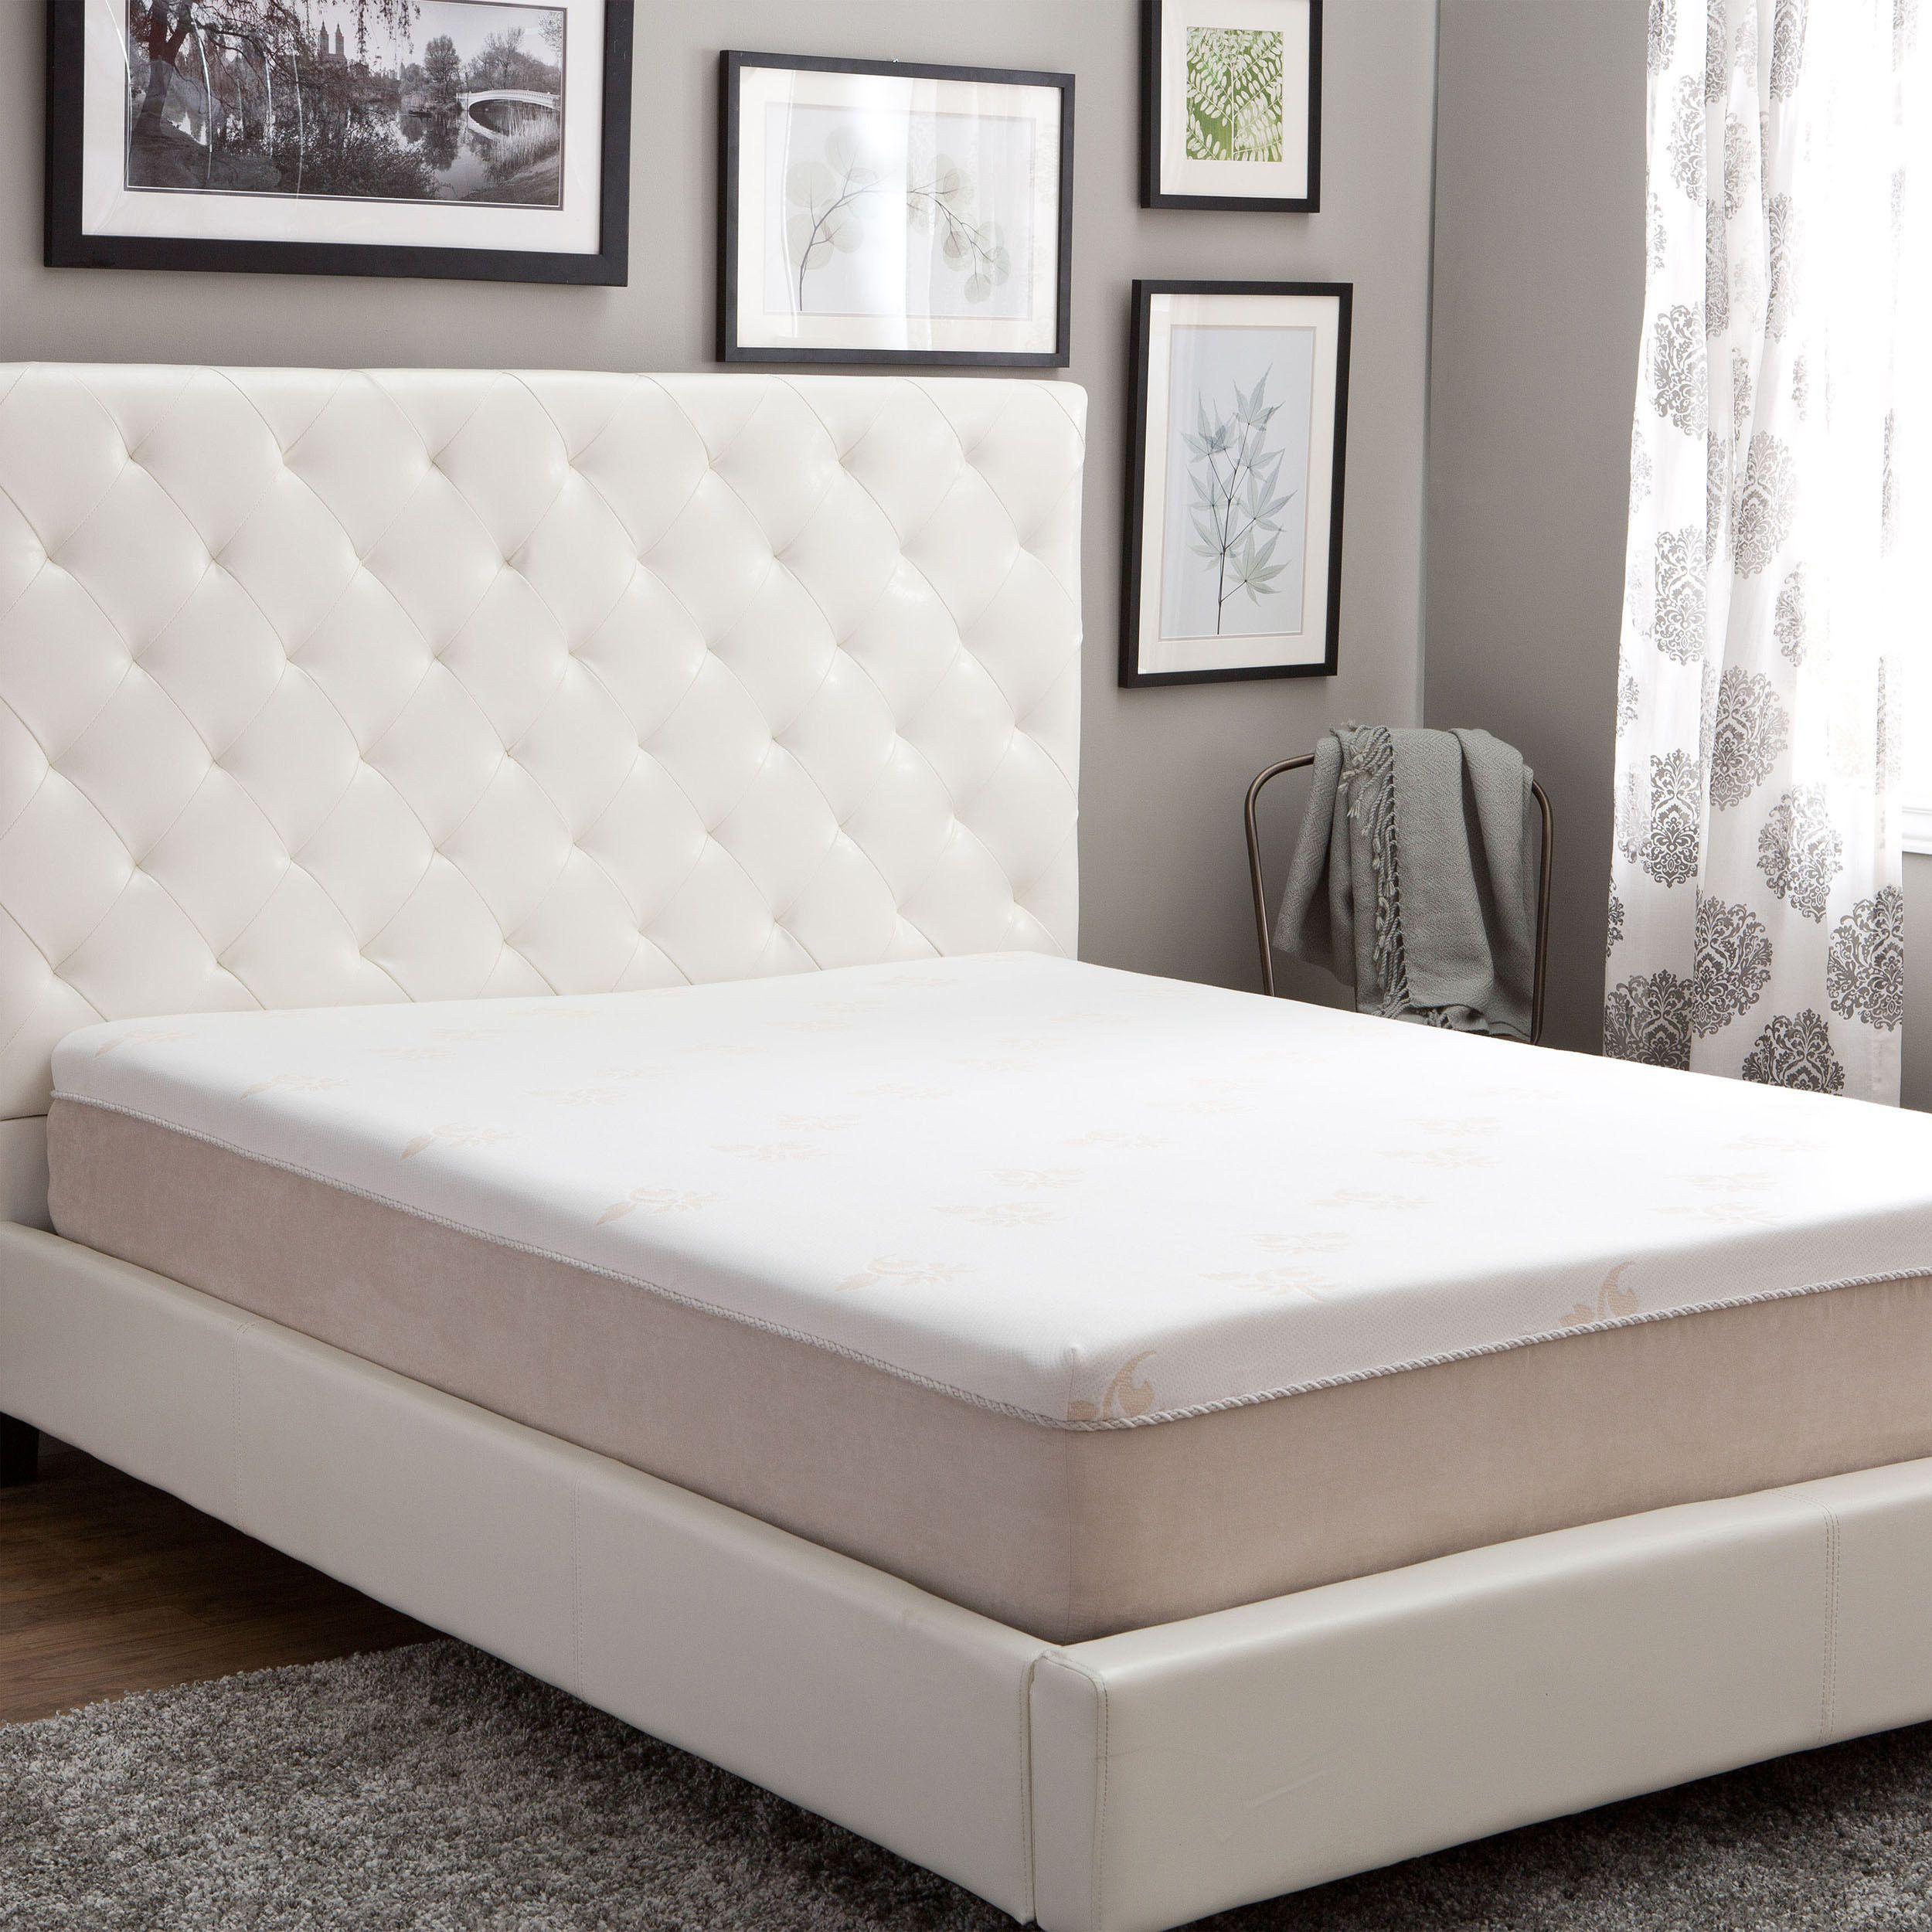 grande hotel collection posture support 11inch kingsize trizone memory foam mattress king black night